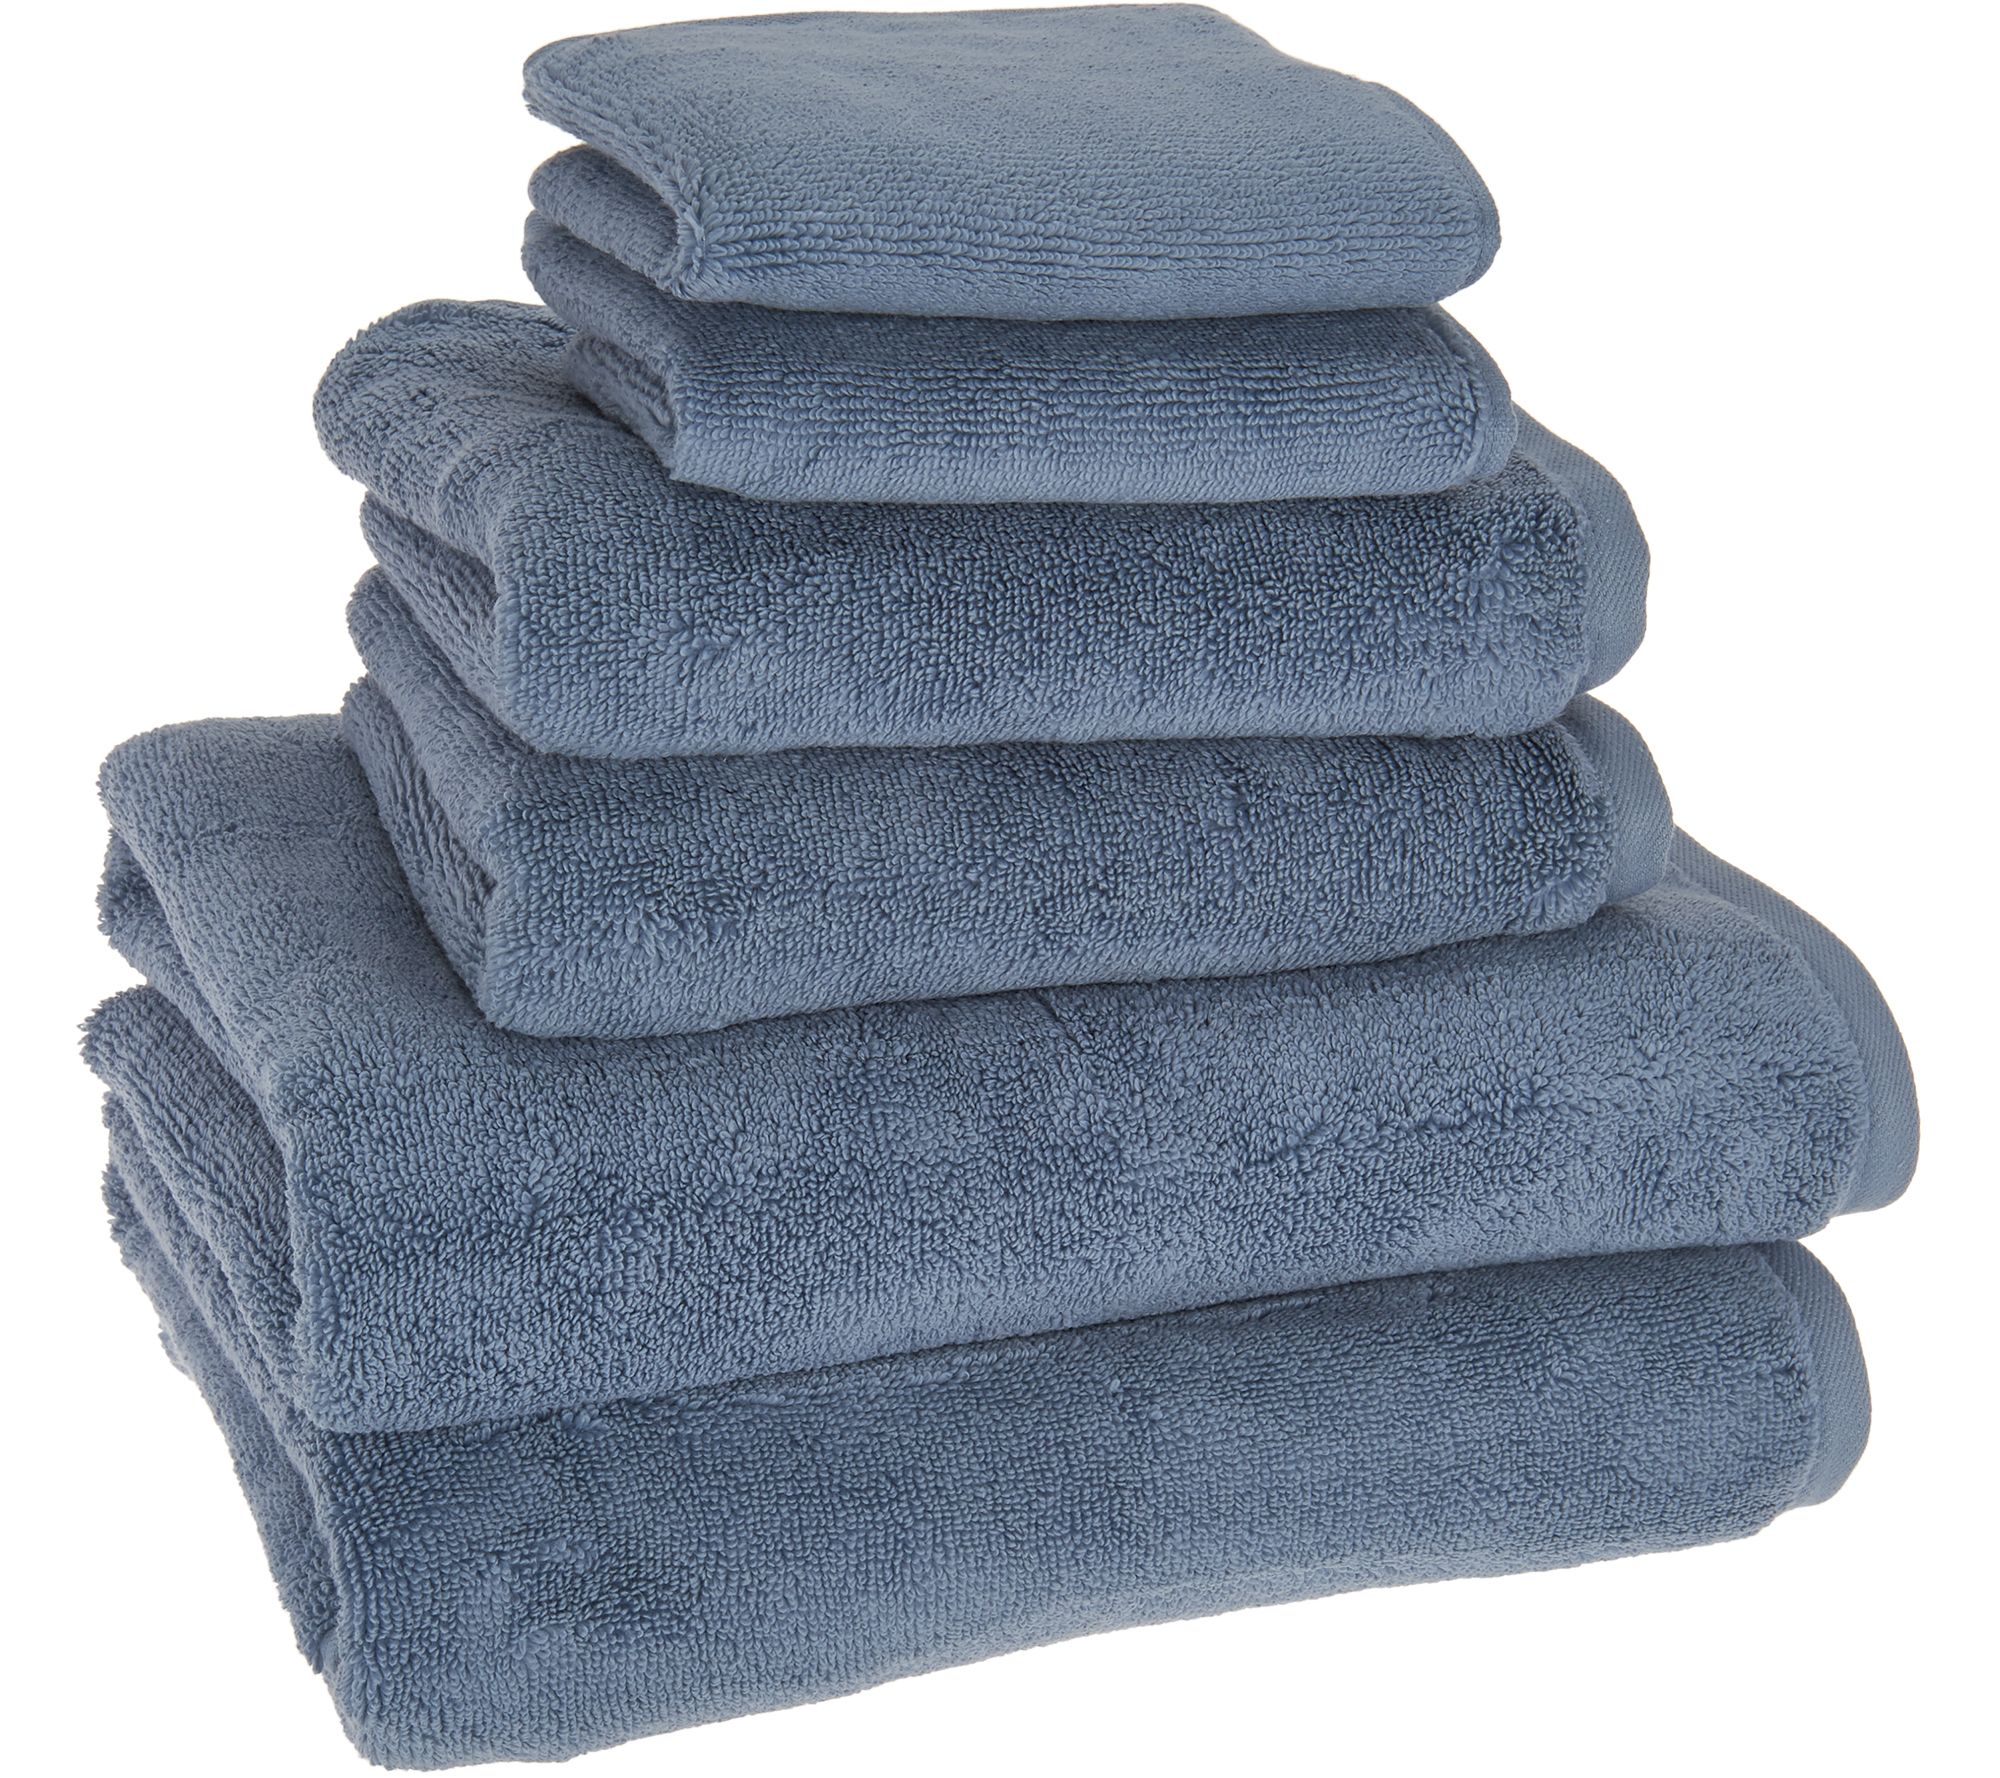 WeaveRIGHT 6 Piece Luxury Performance Towel Set